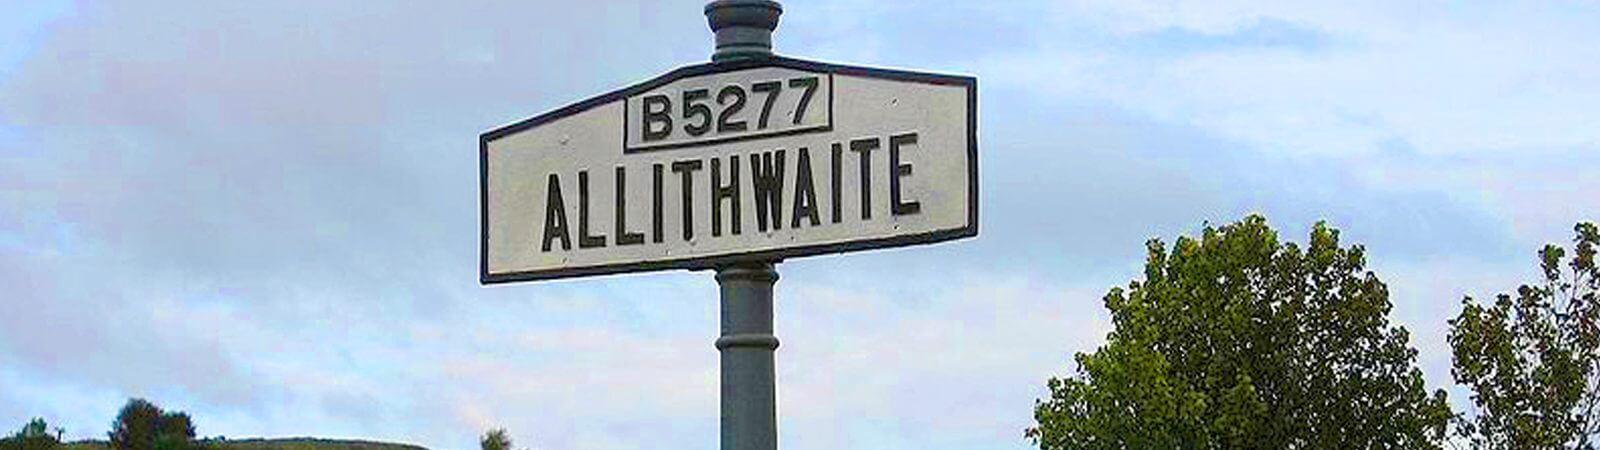 Green Lane, Allithwaite